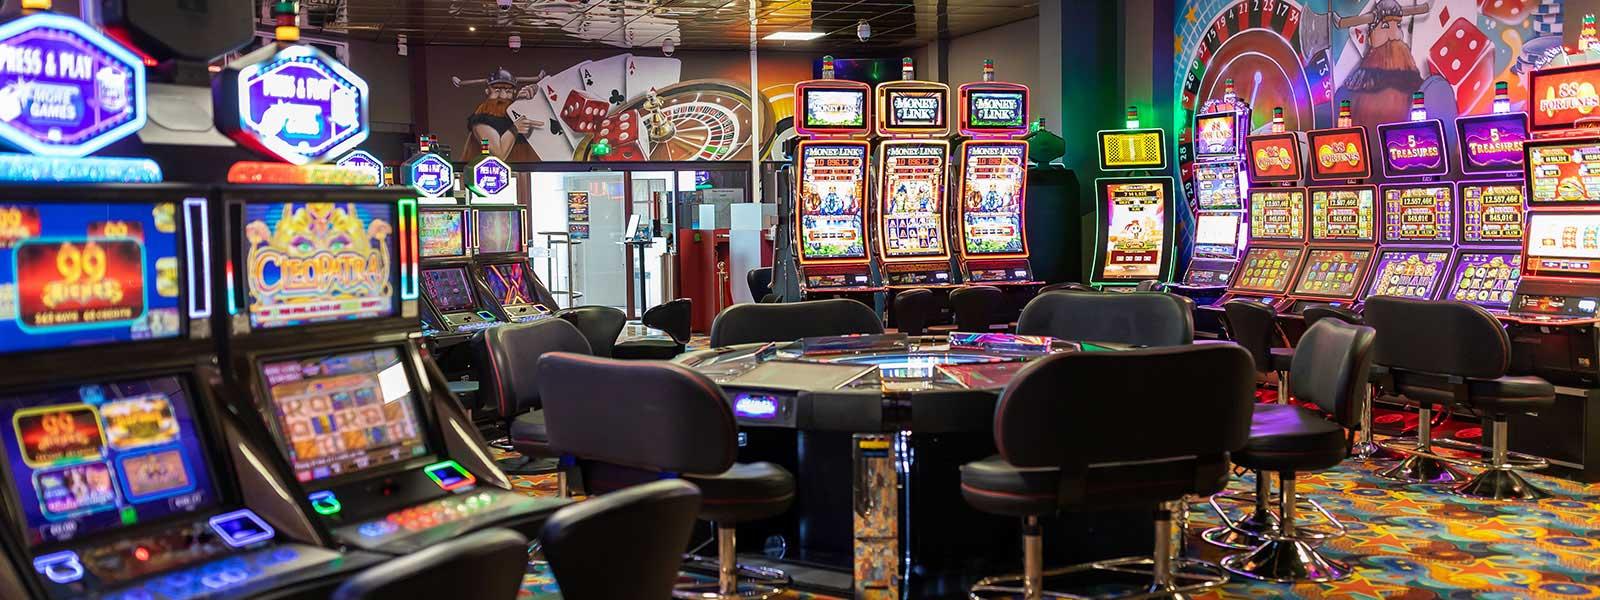 casino-slide